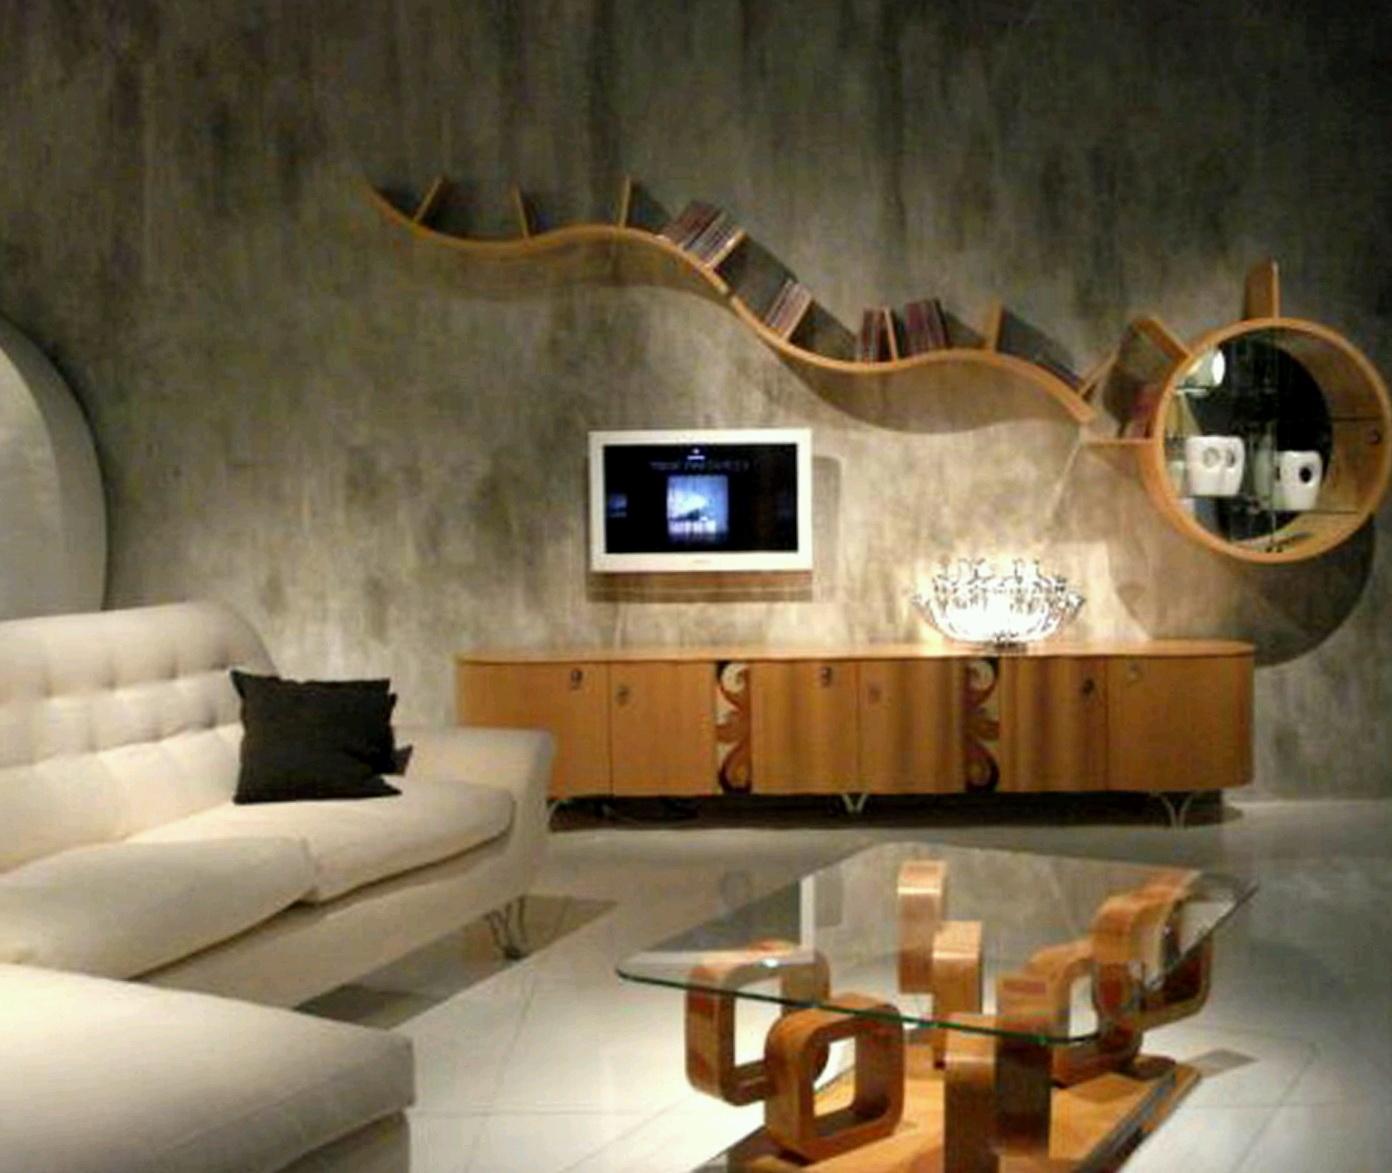 Living Room Shelves On Wall